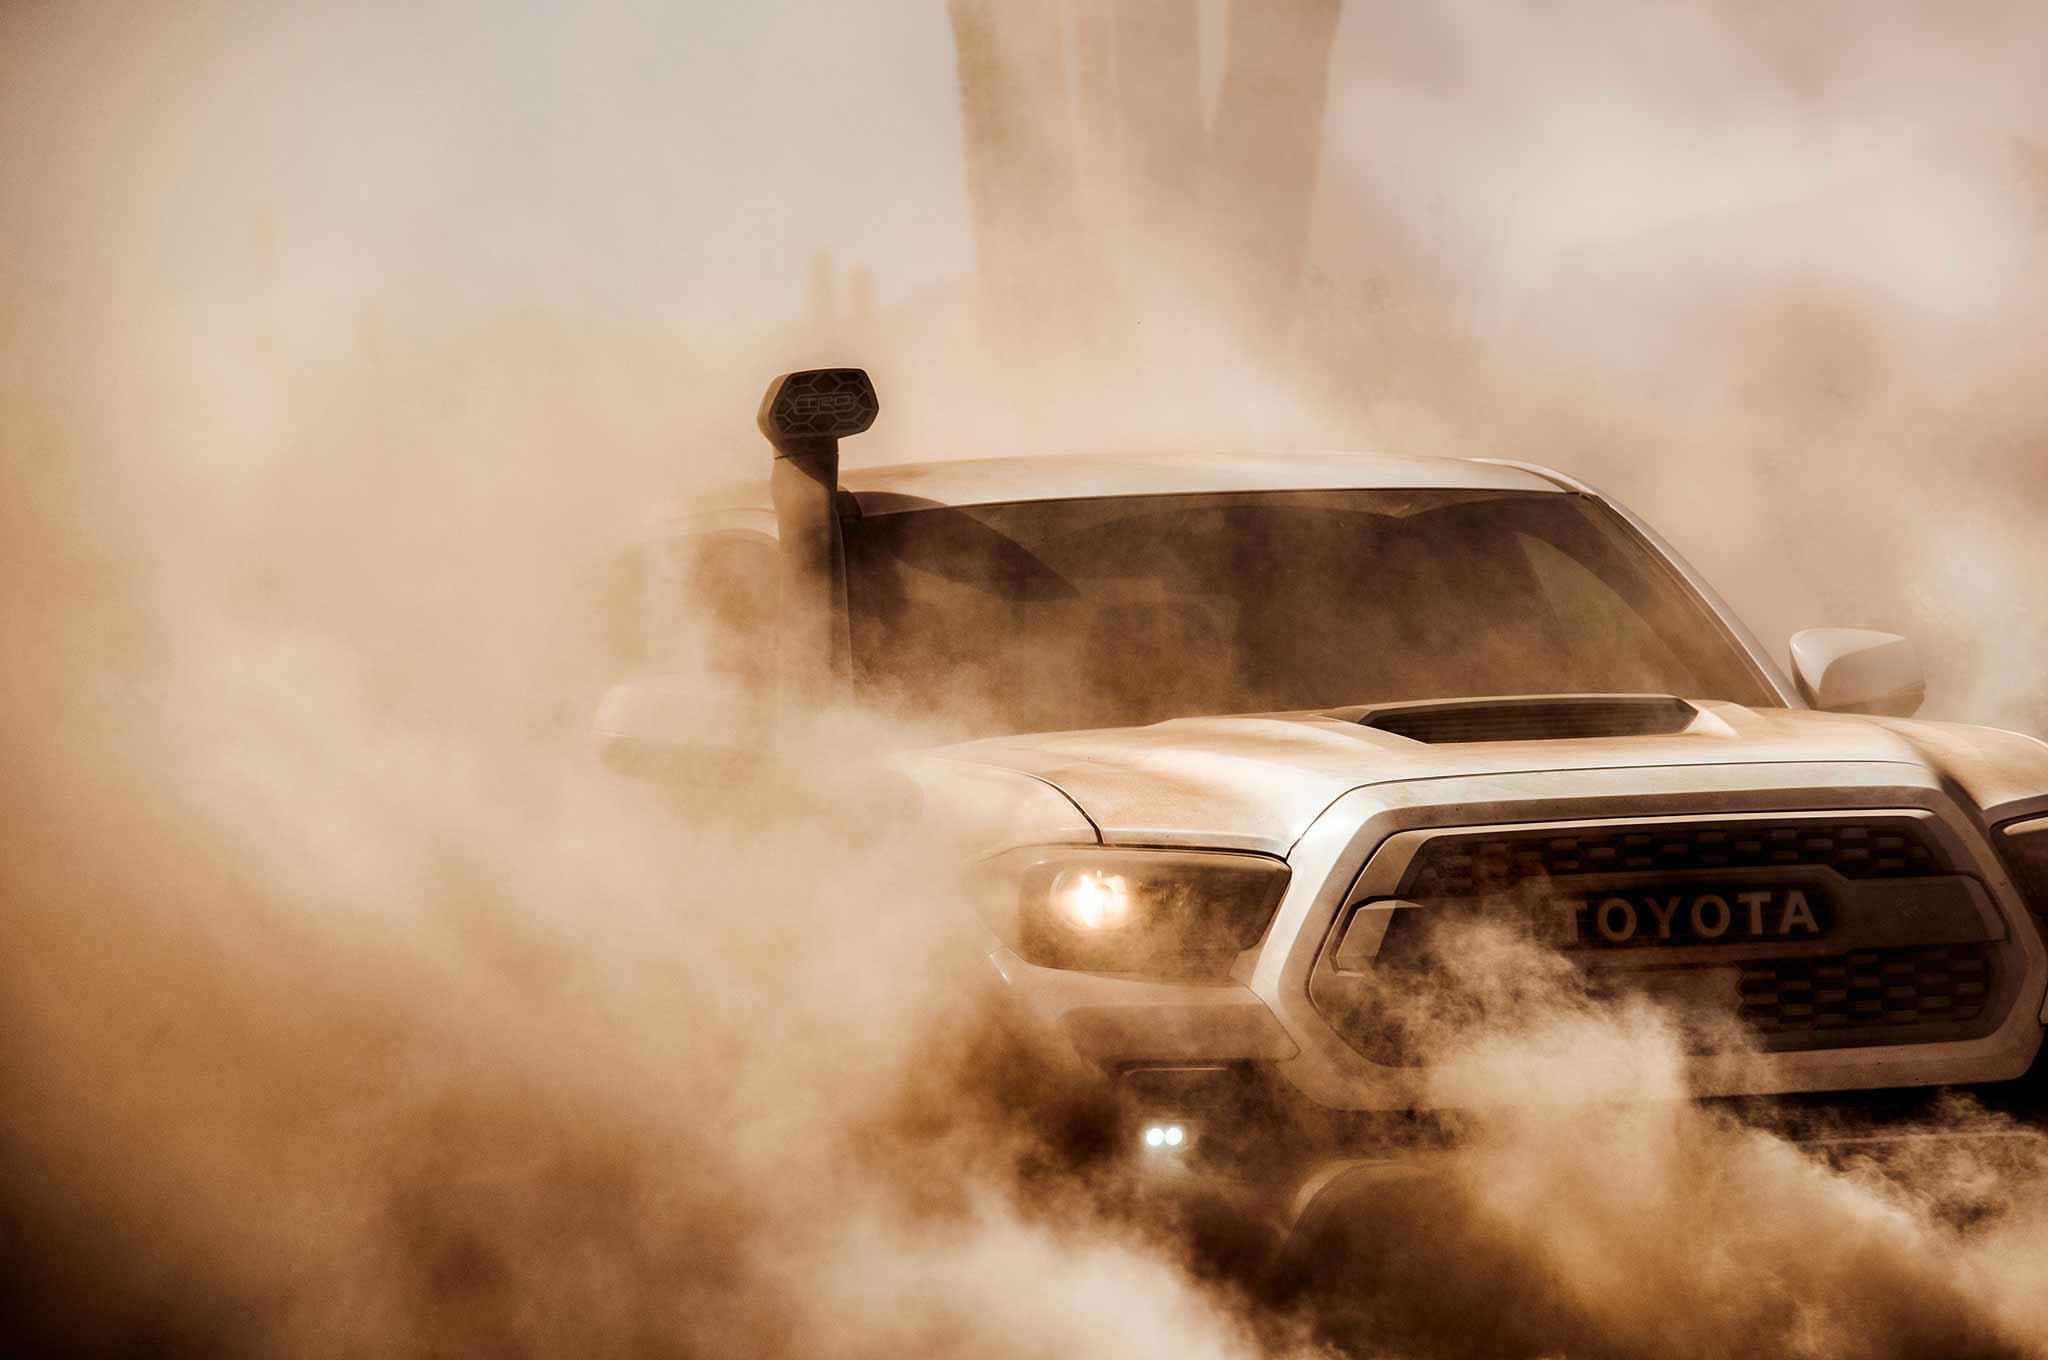 2019 Toyota Tacoma TRD Pro Teaser